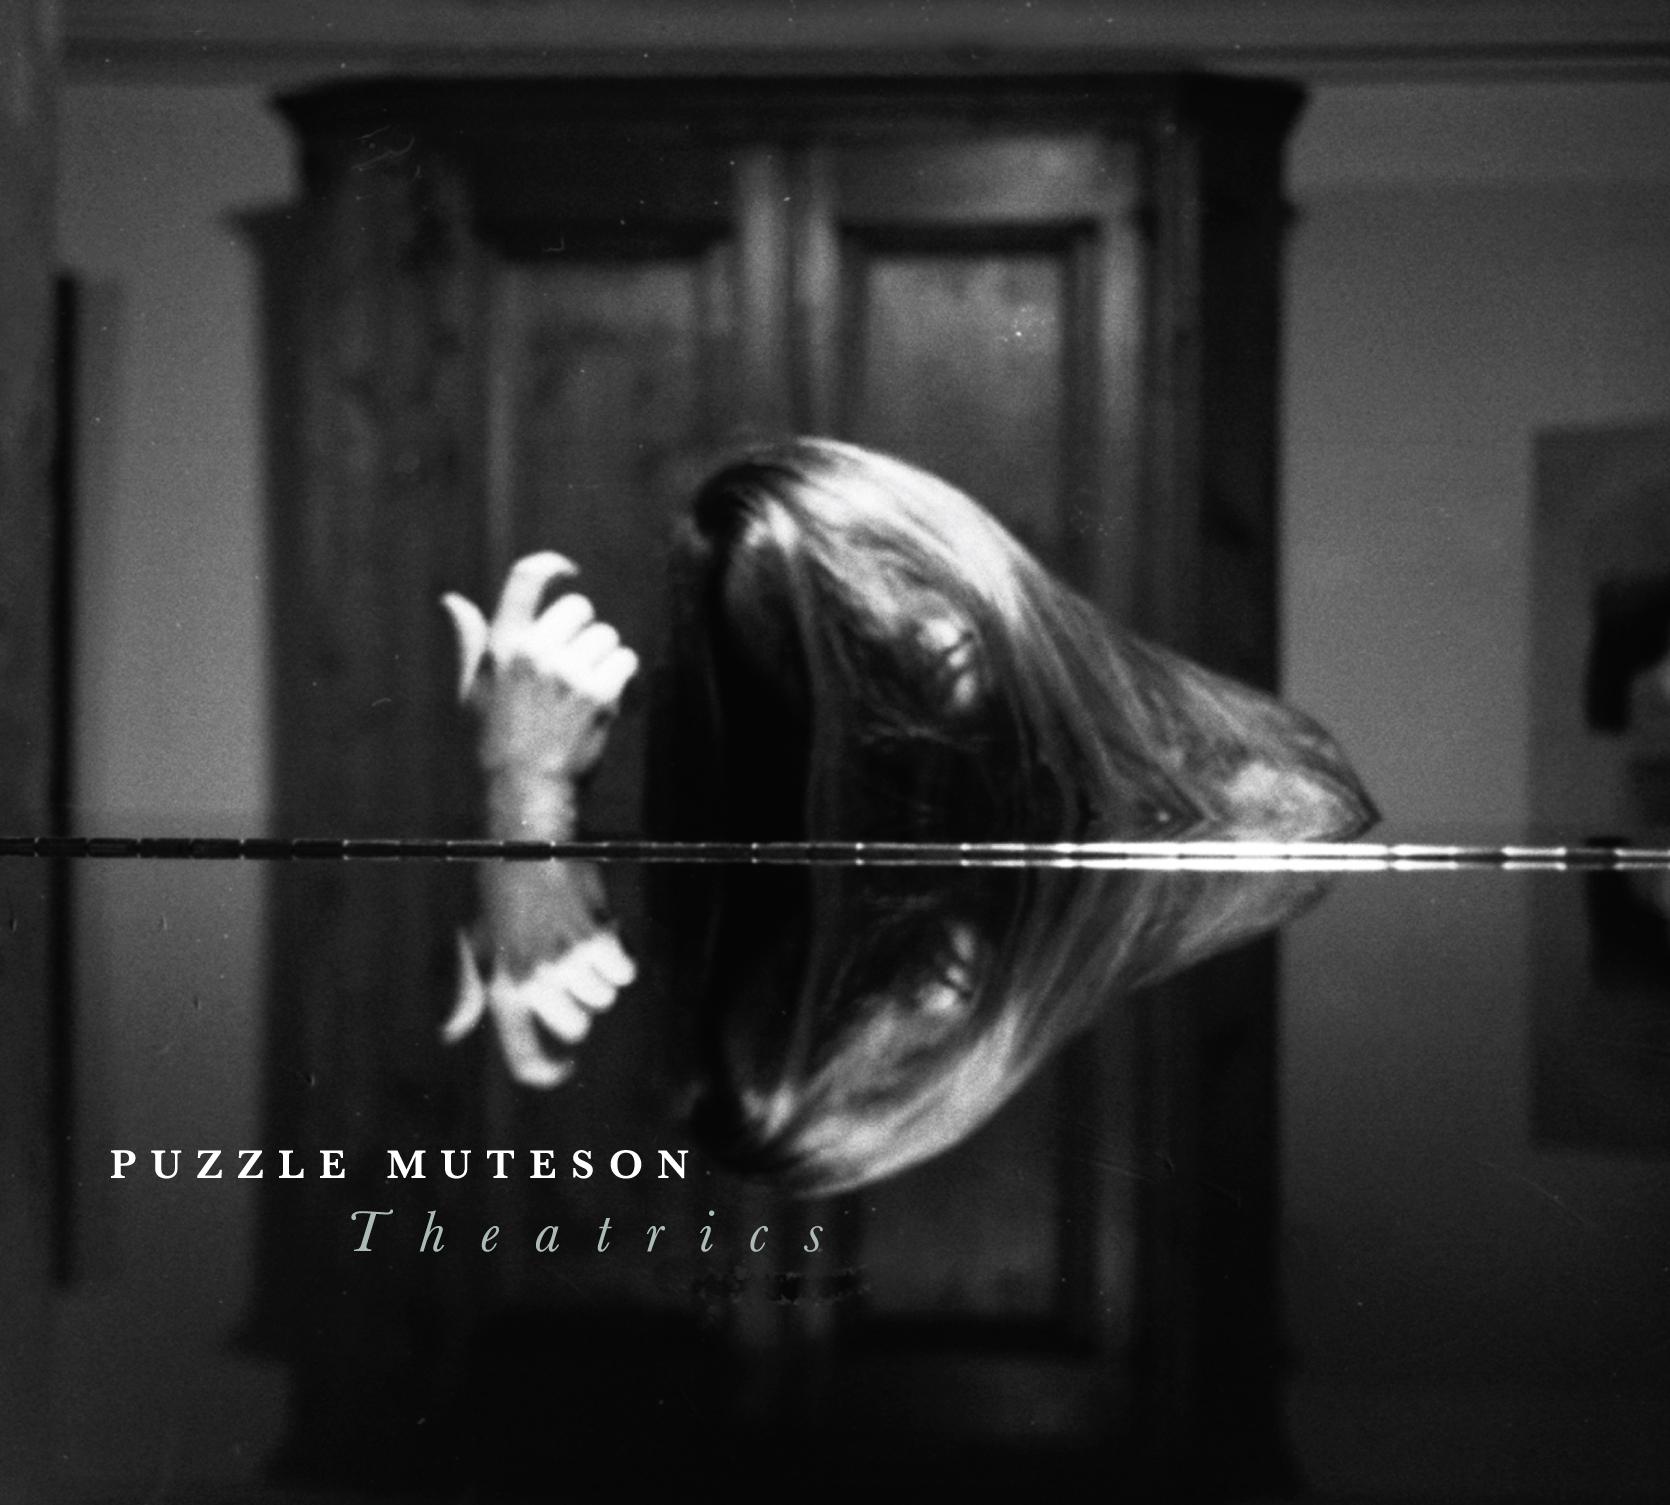 Chosen One: Puzzle Muteson